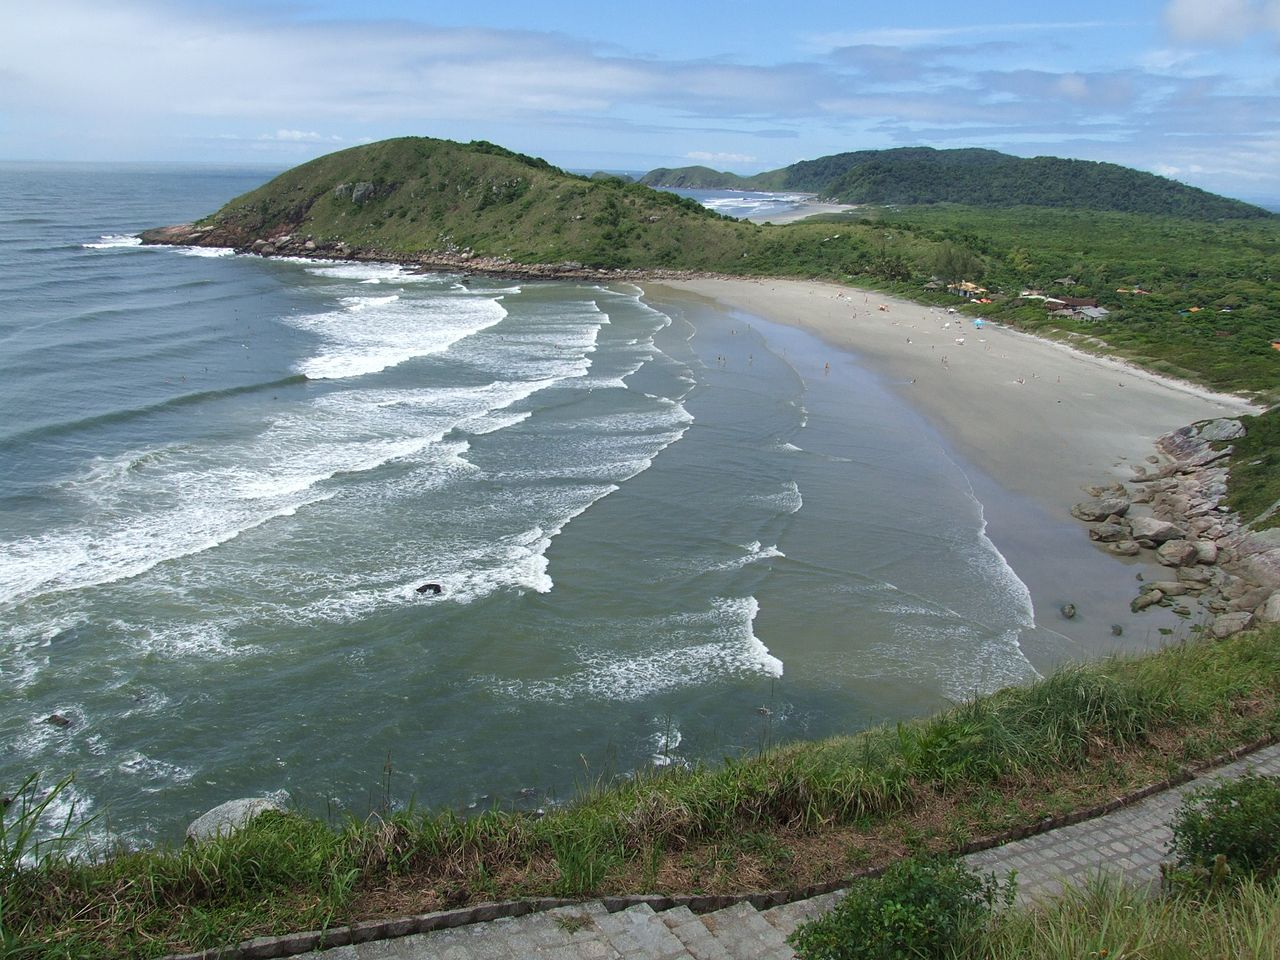 praias internacionais famosas